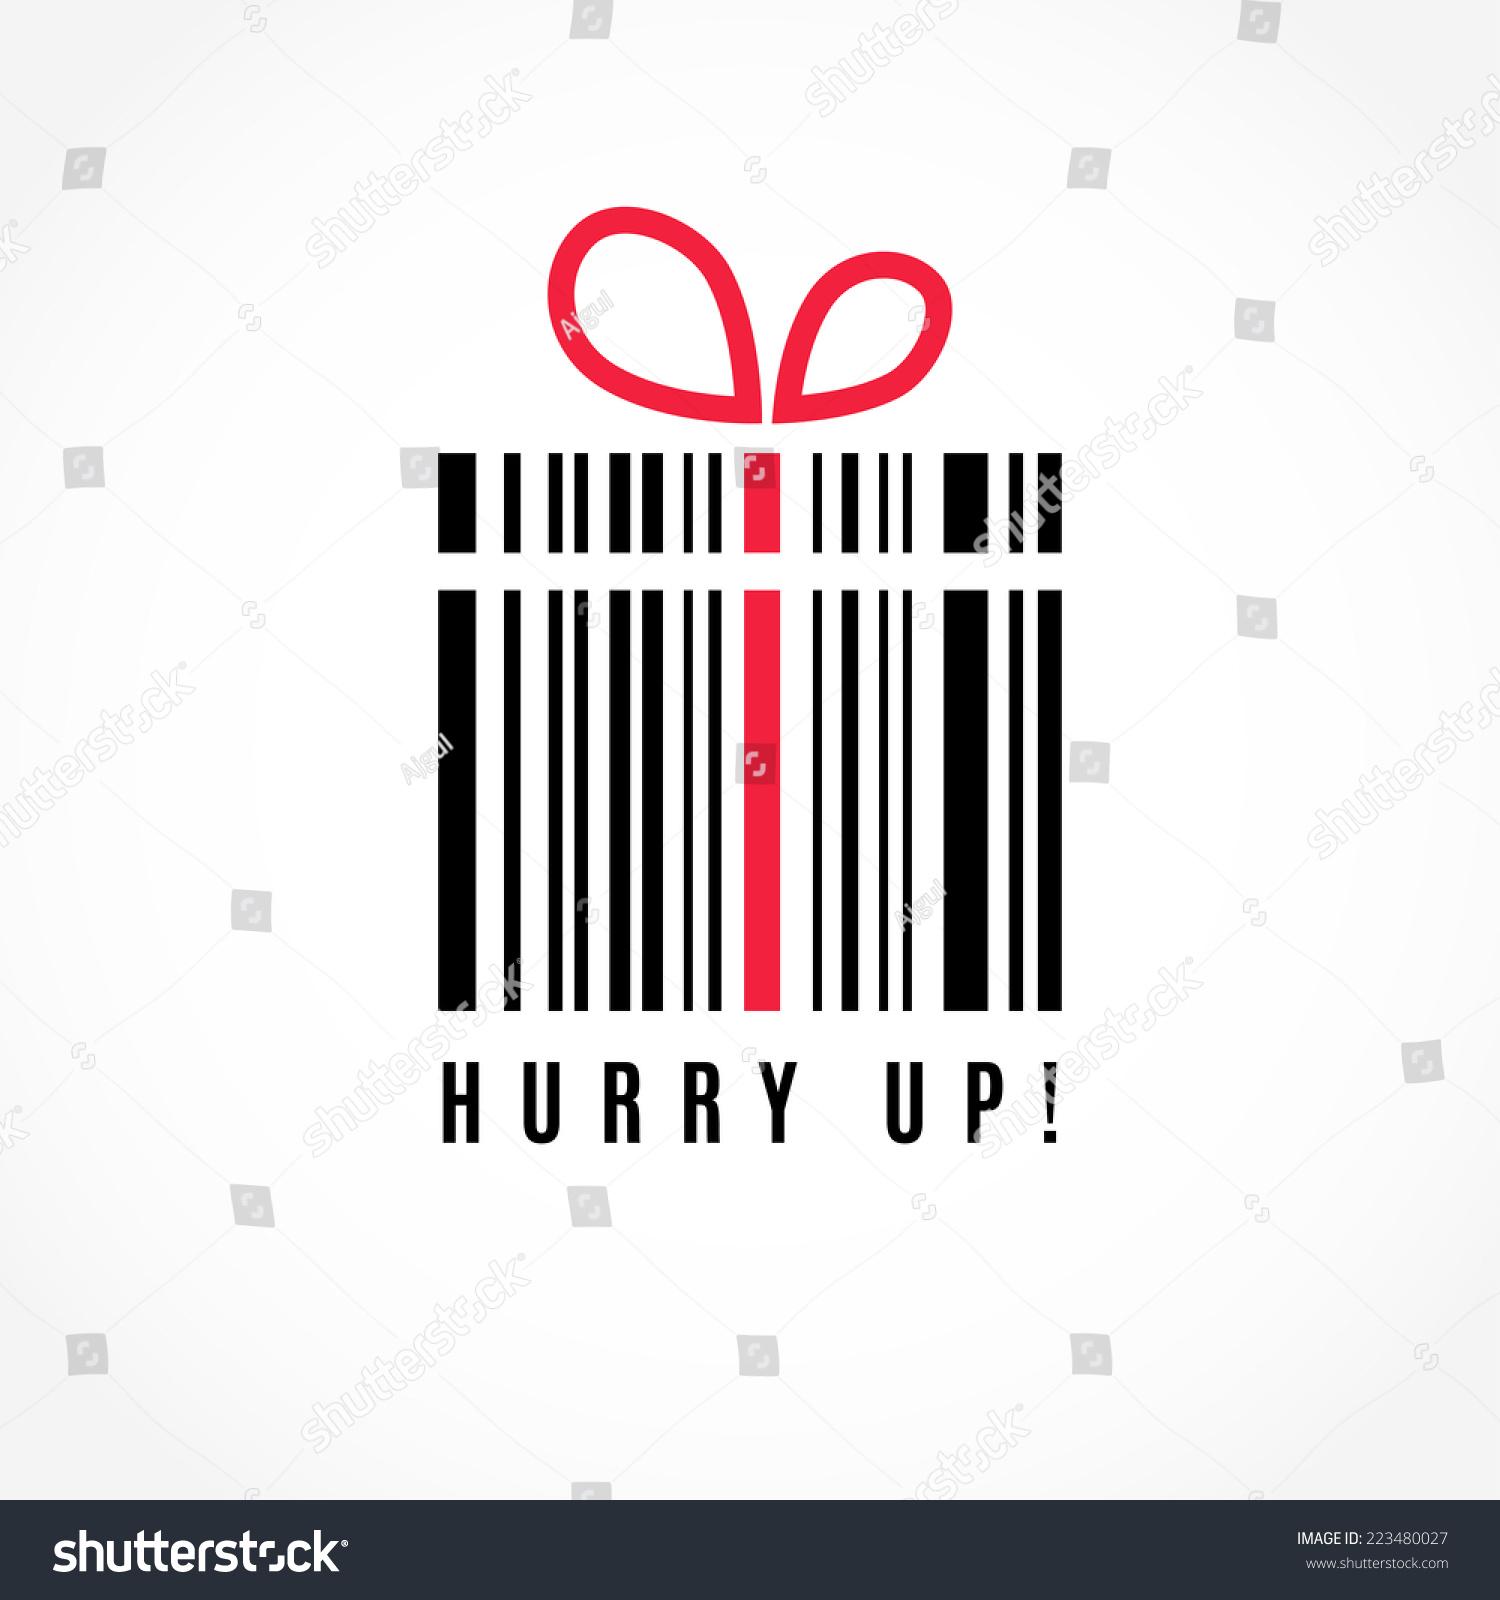 Hurry up discount present barcode vector stock vector for Cheap logo